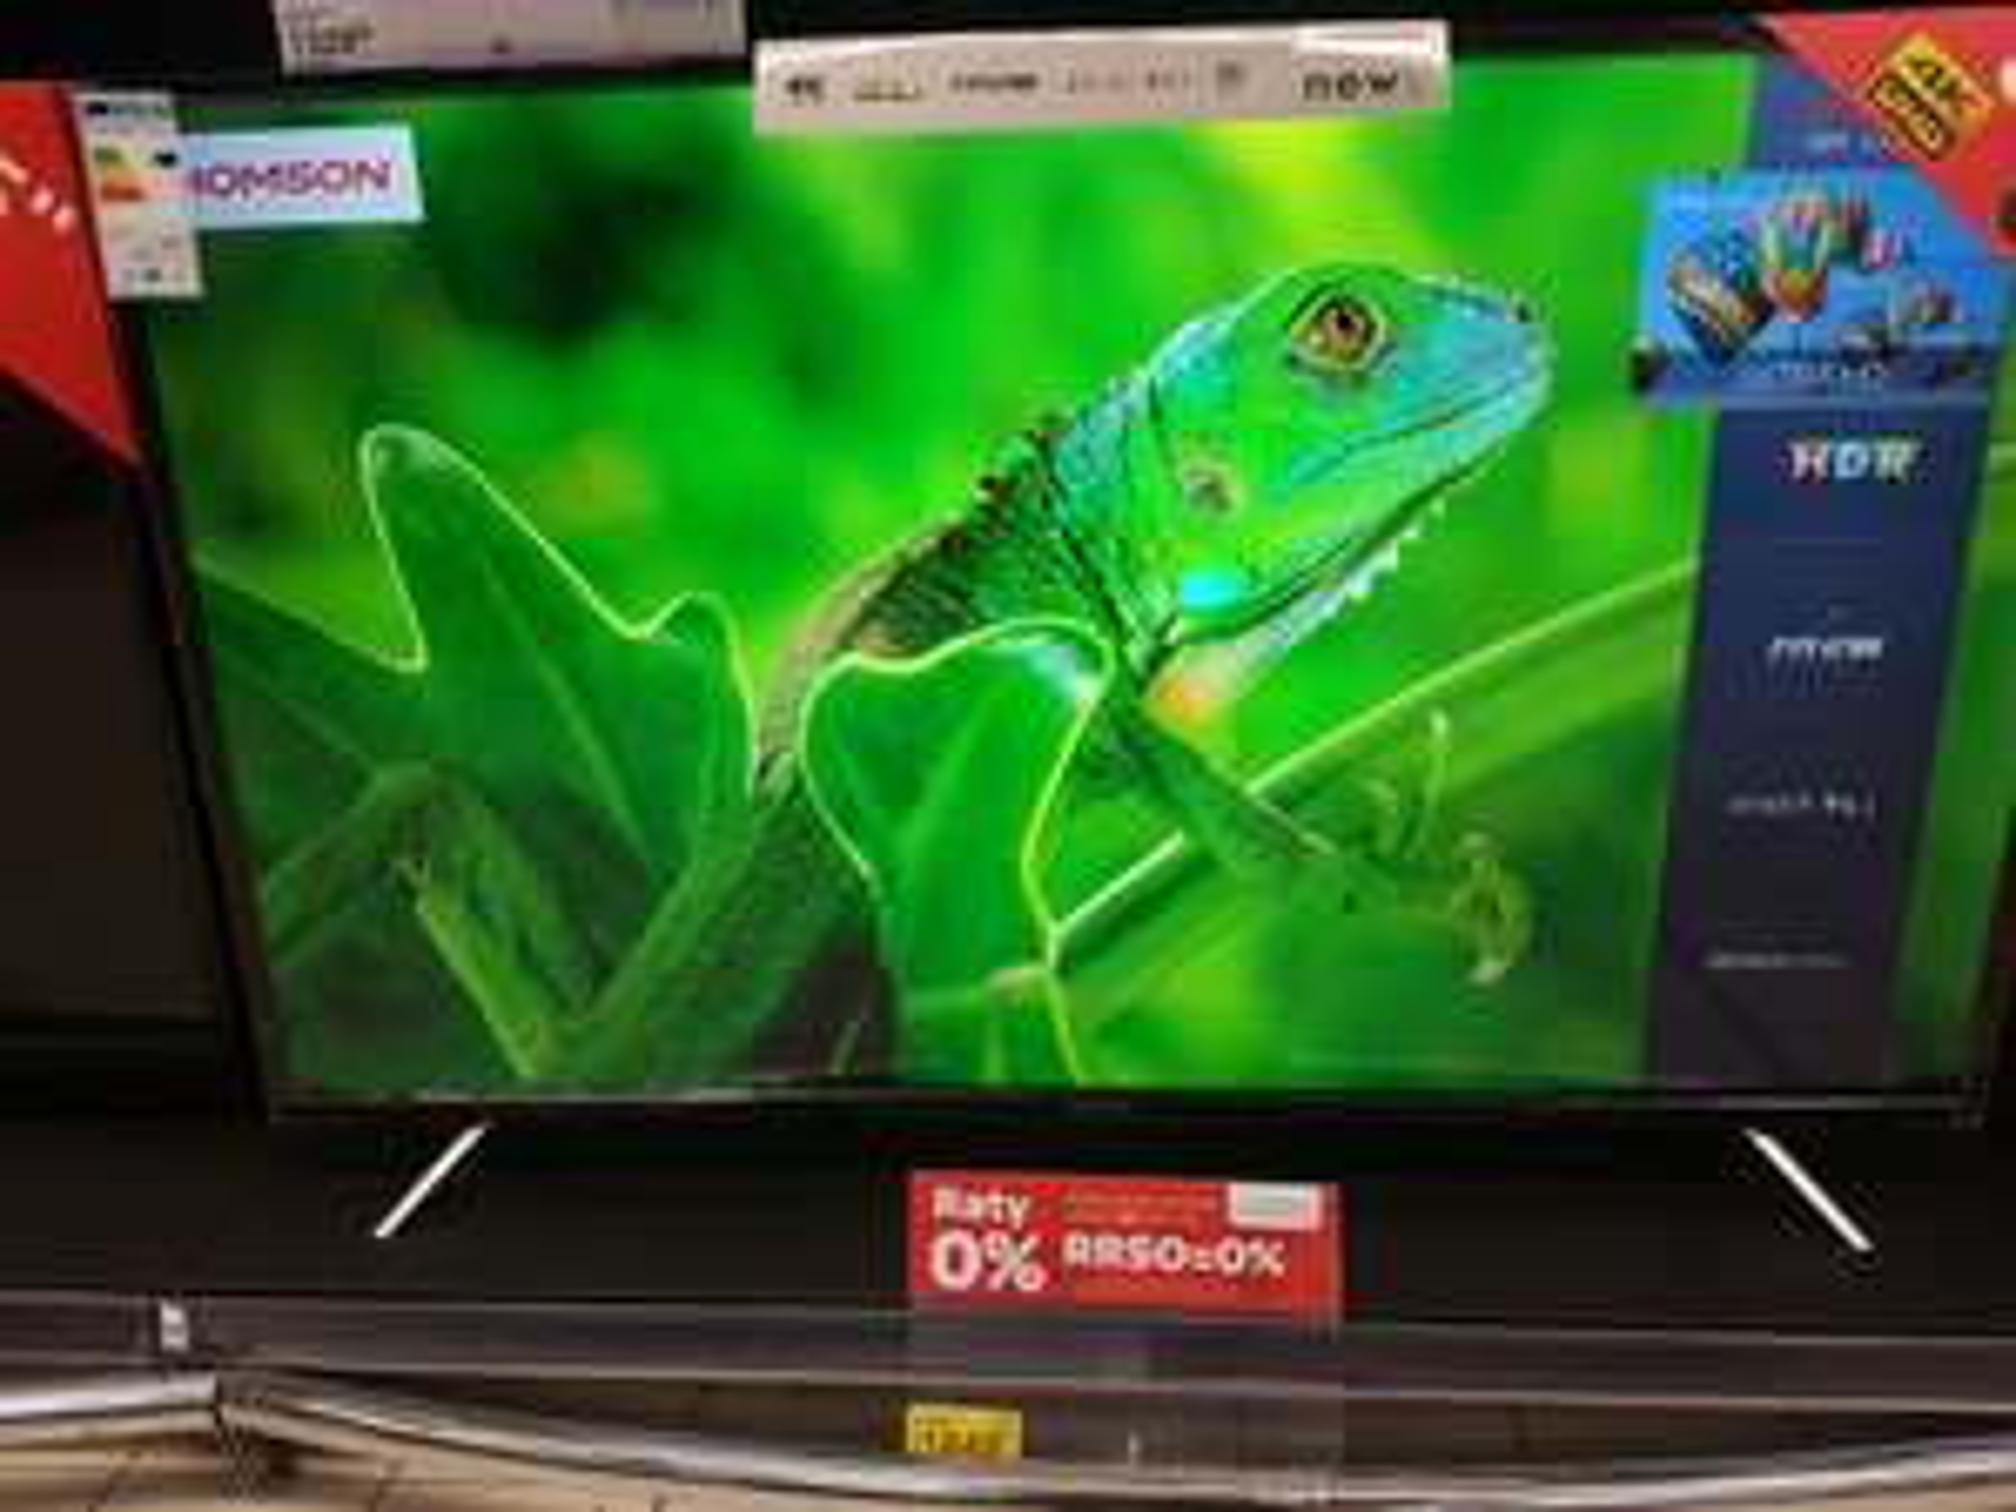 Telewizor Thomson 55cali UHD 4k HDR 55ut6006 netflix Carrefour